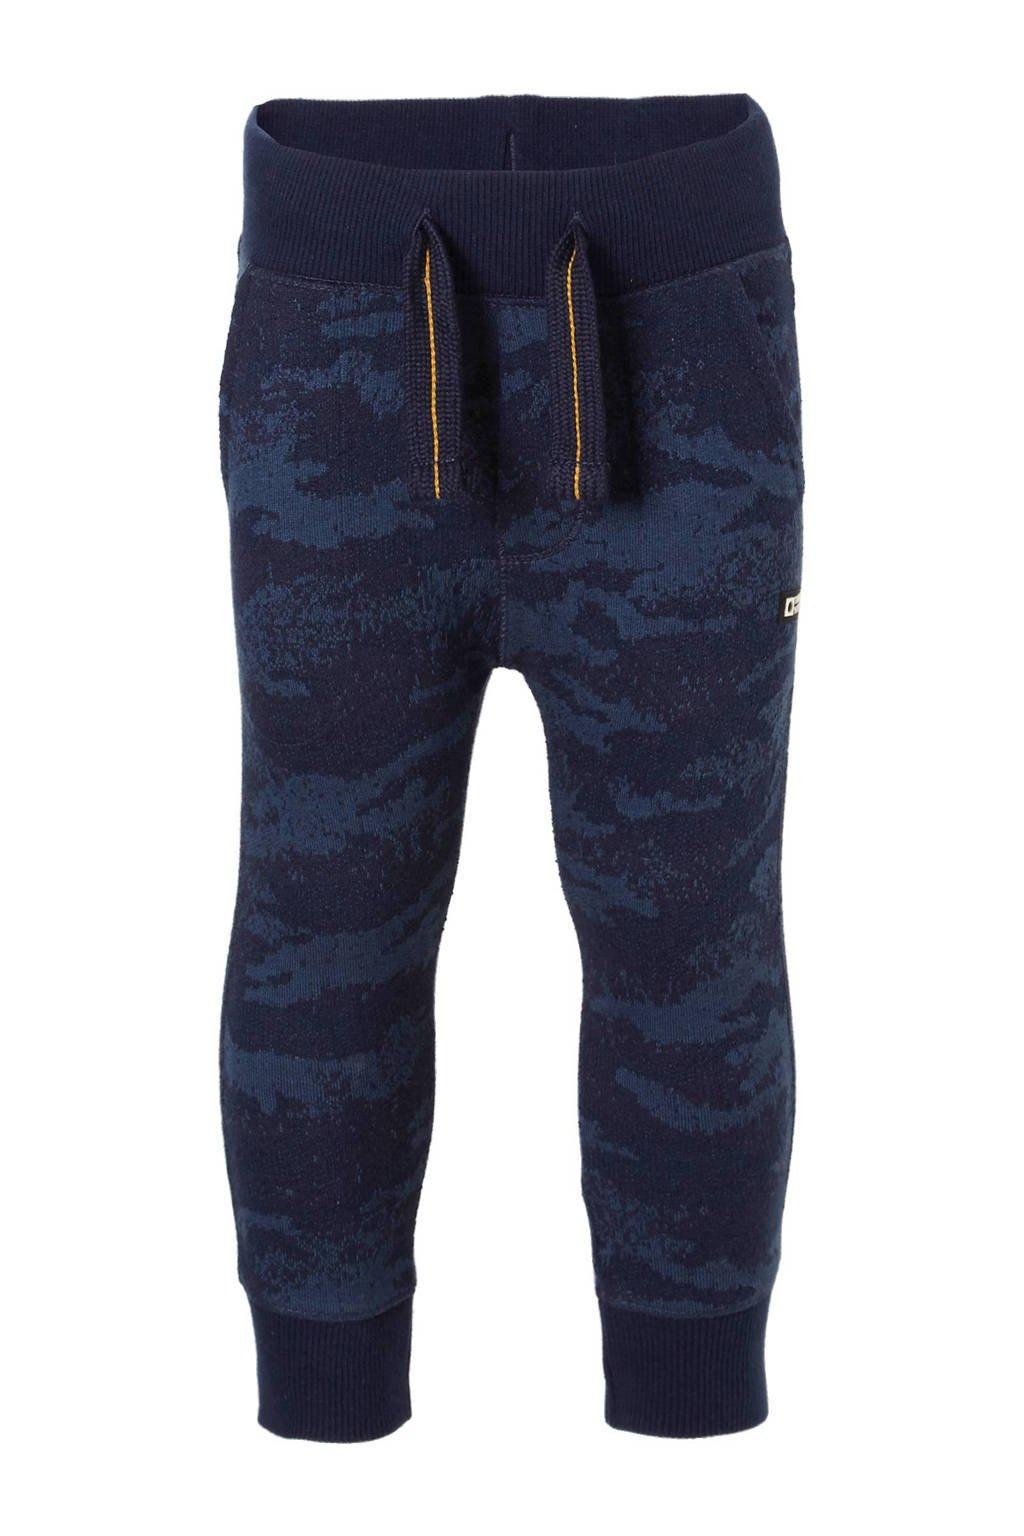 Tumble 'n Dry Lo   sweatpants Konrad donkerblauw, 100% katoen